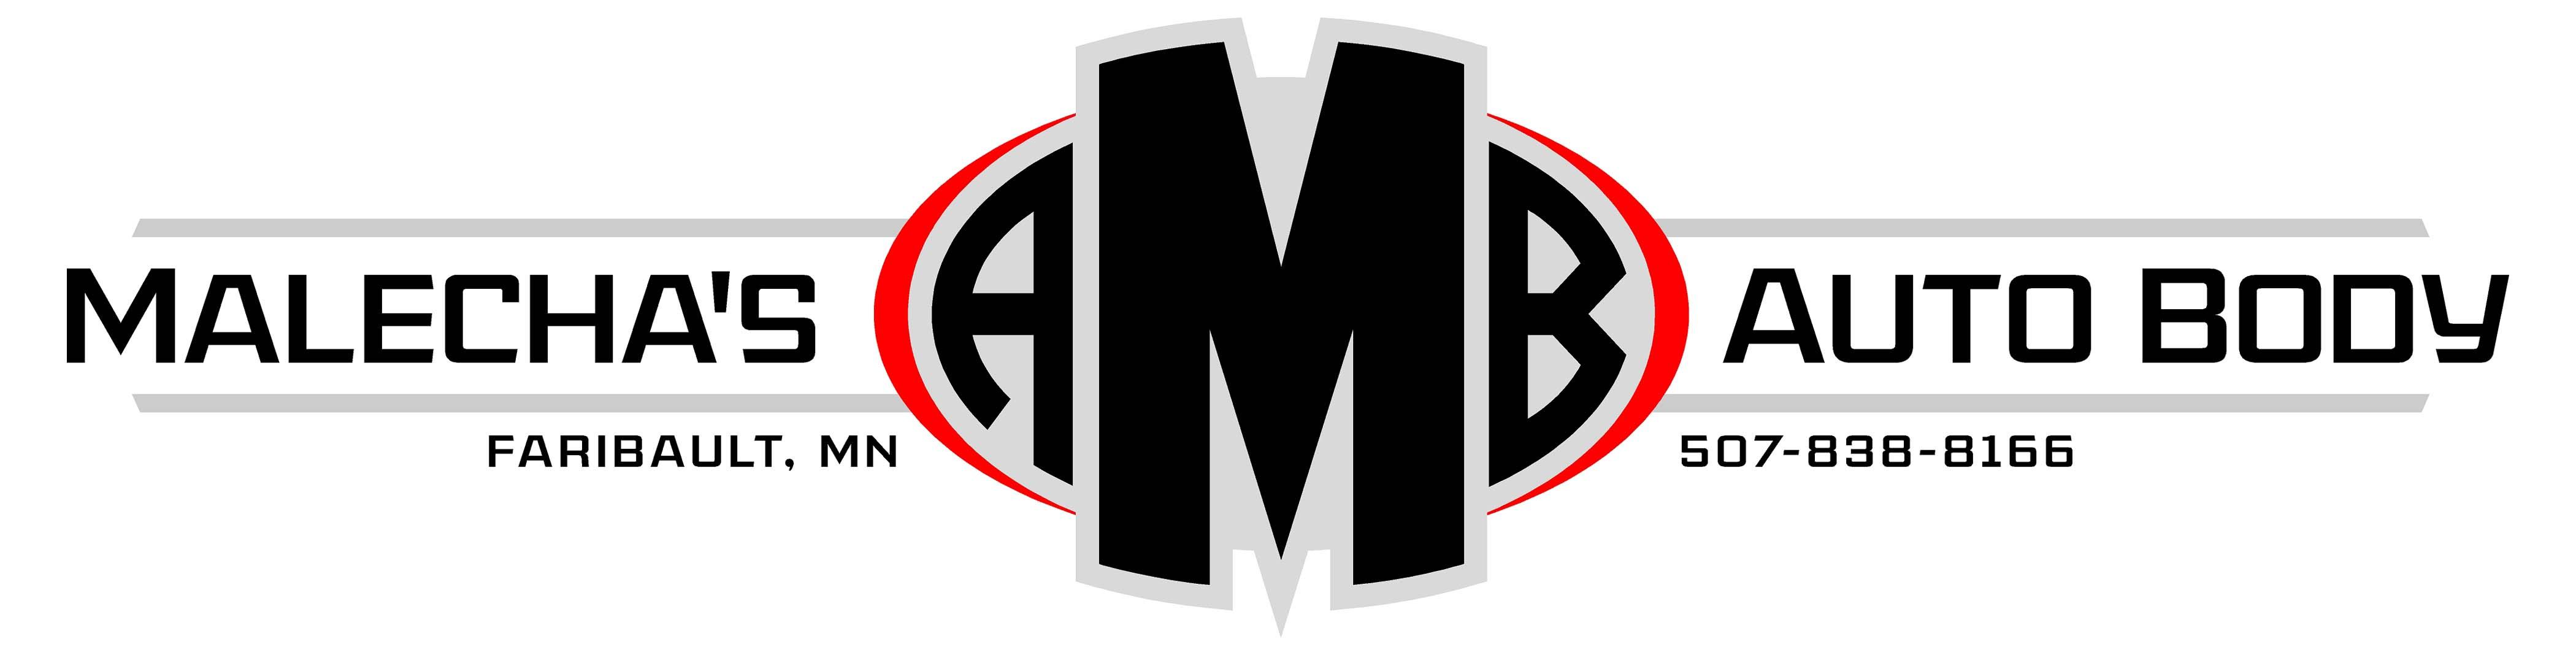 Auto Body Repair Shop Faribault Mn Malecha S Auto Body Llc